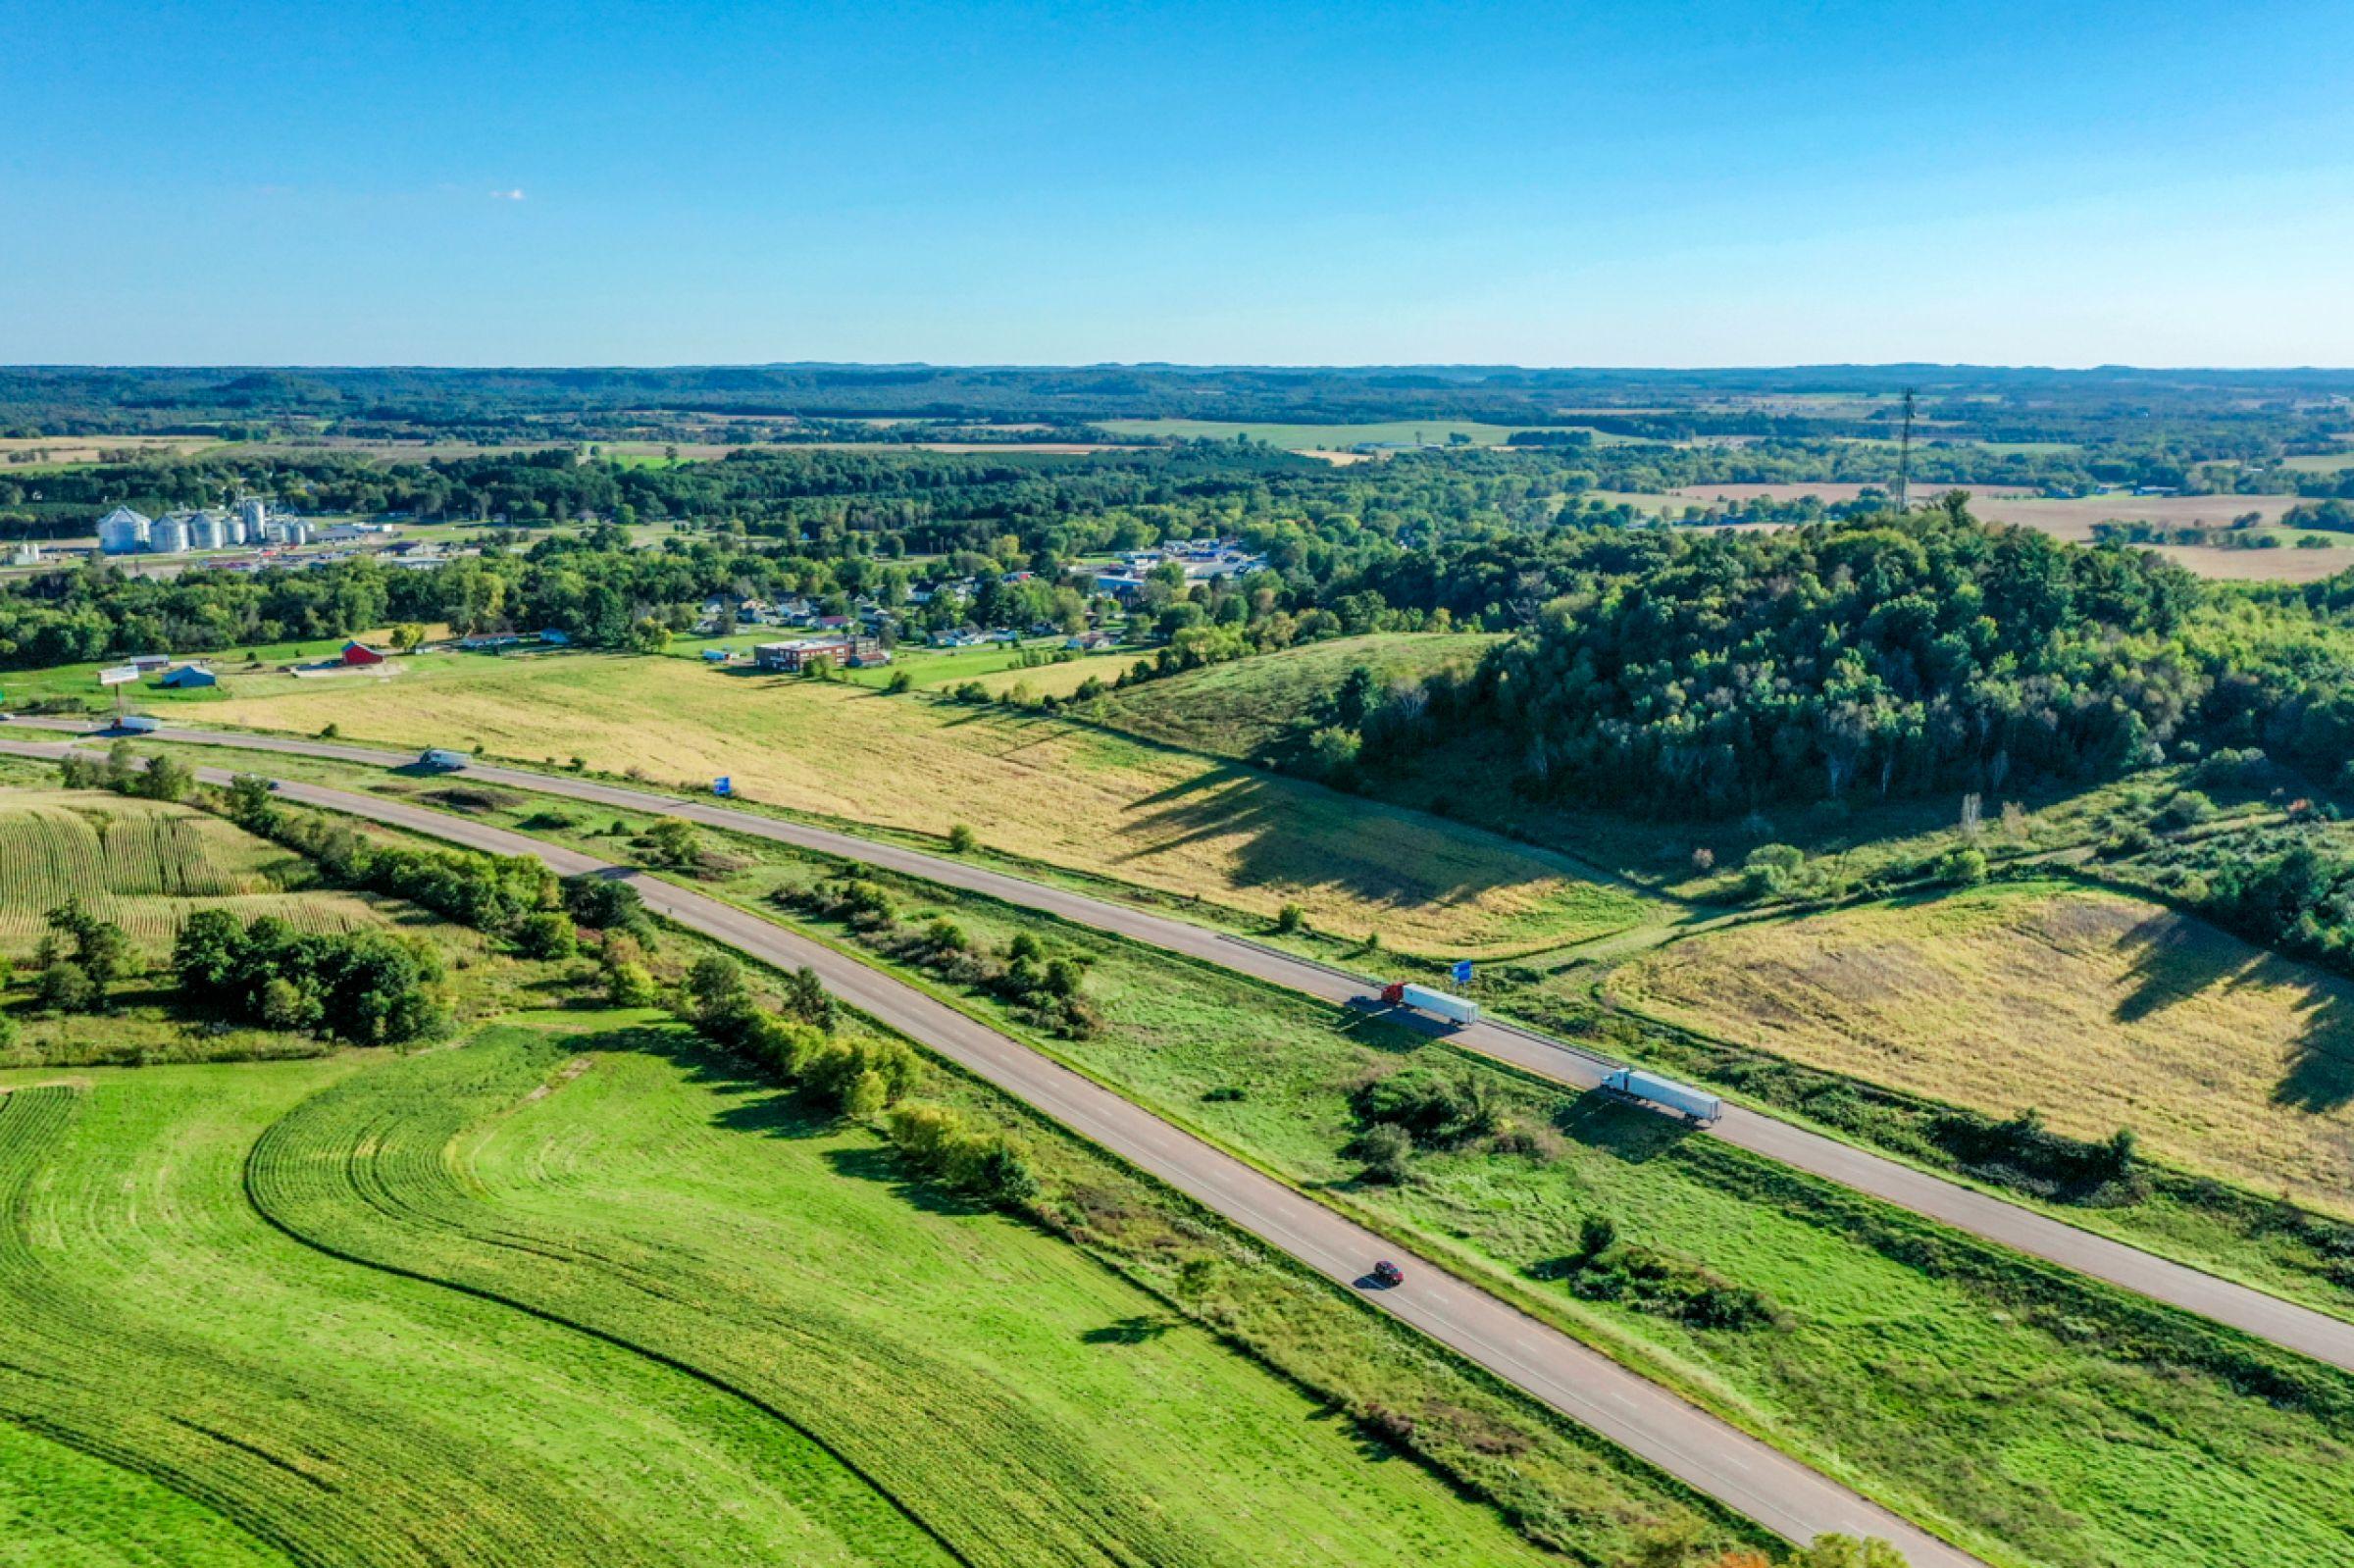 2-4449-acres-ml-3rd-street-hixton-54635-0-2021-09-16-164754.jpg